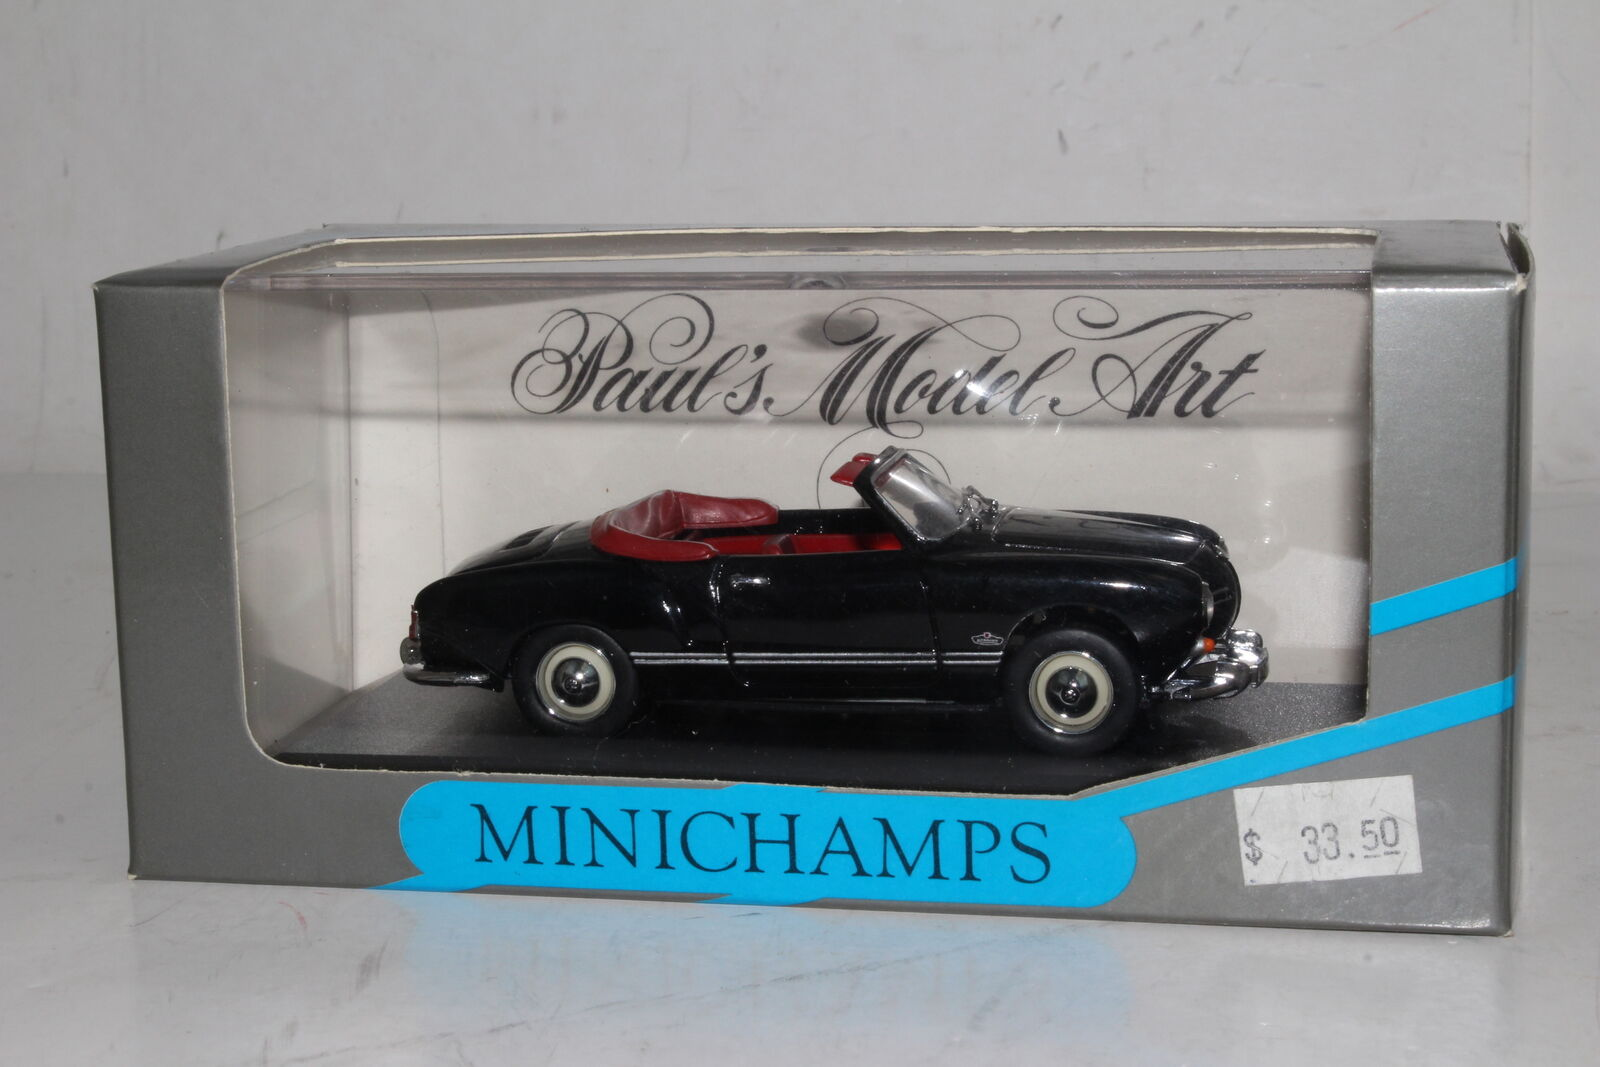 MINICHAMPS DIECAST VOLKSWAGEN VW KARMANN GHIA CABRIOLET CONV., 1 43, BOXED